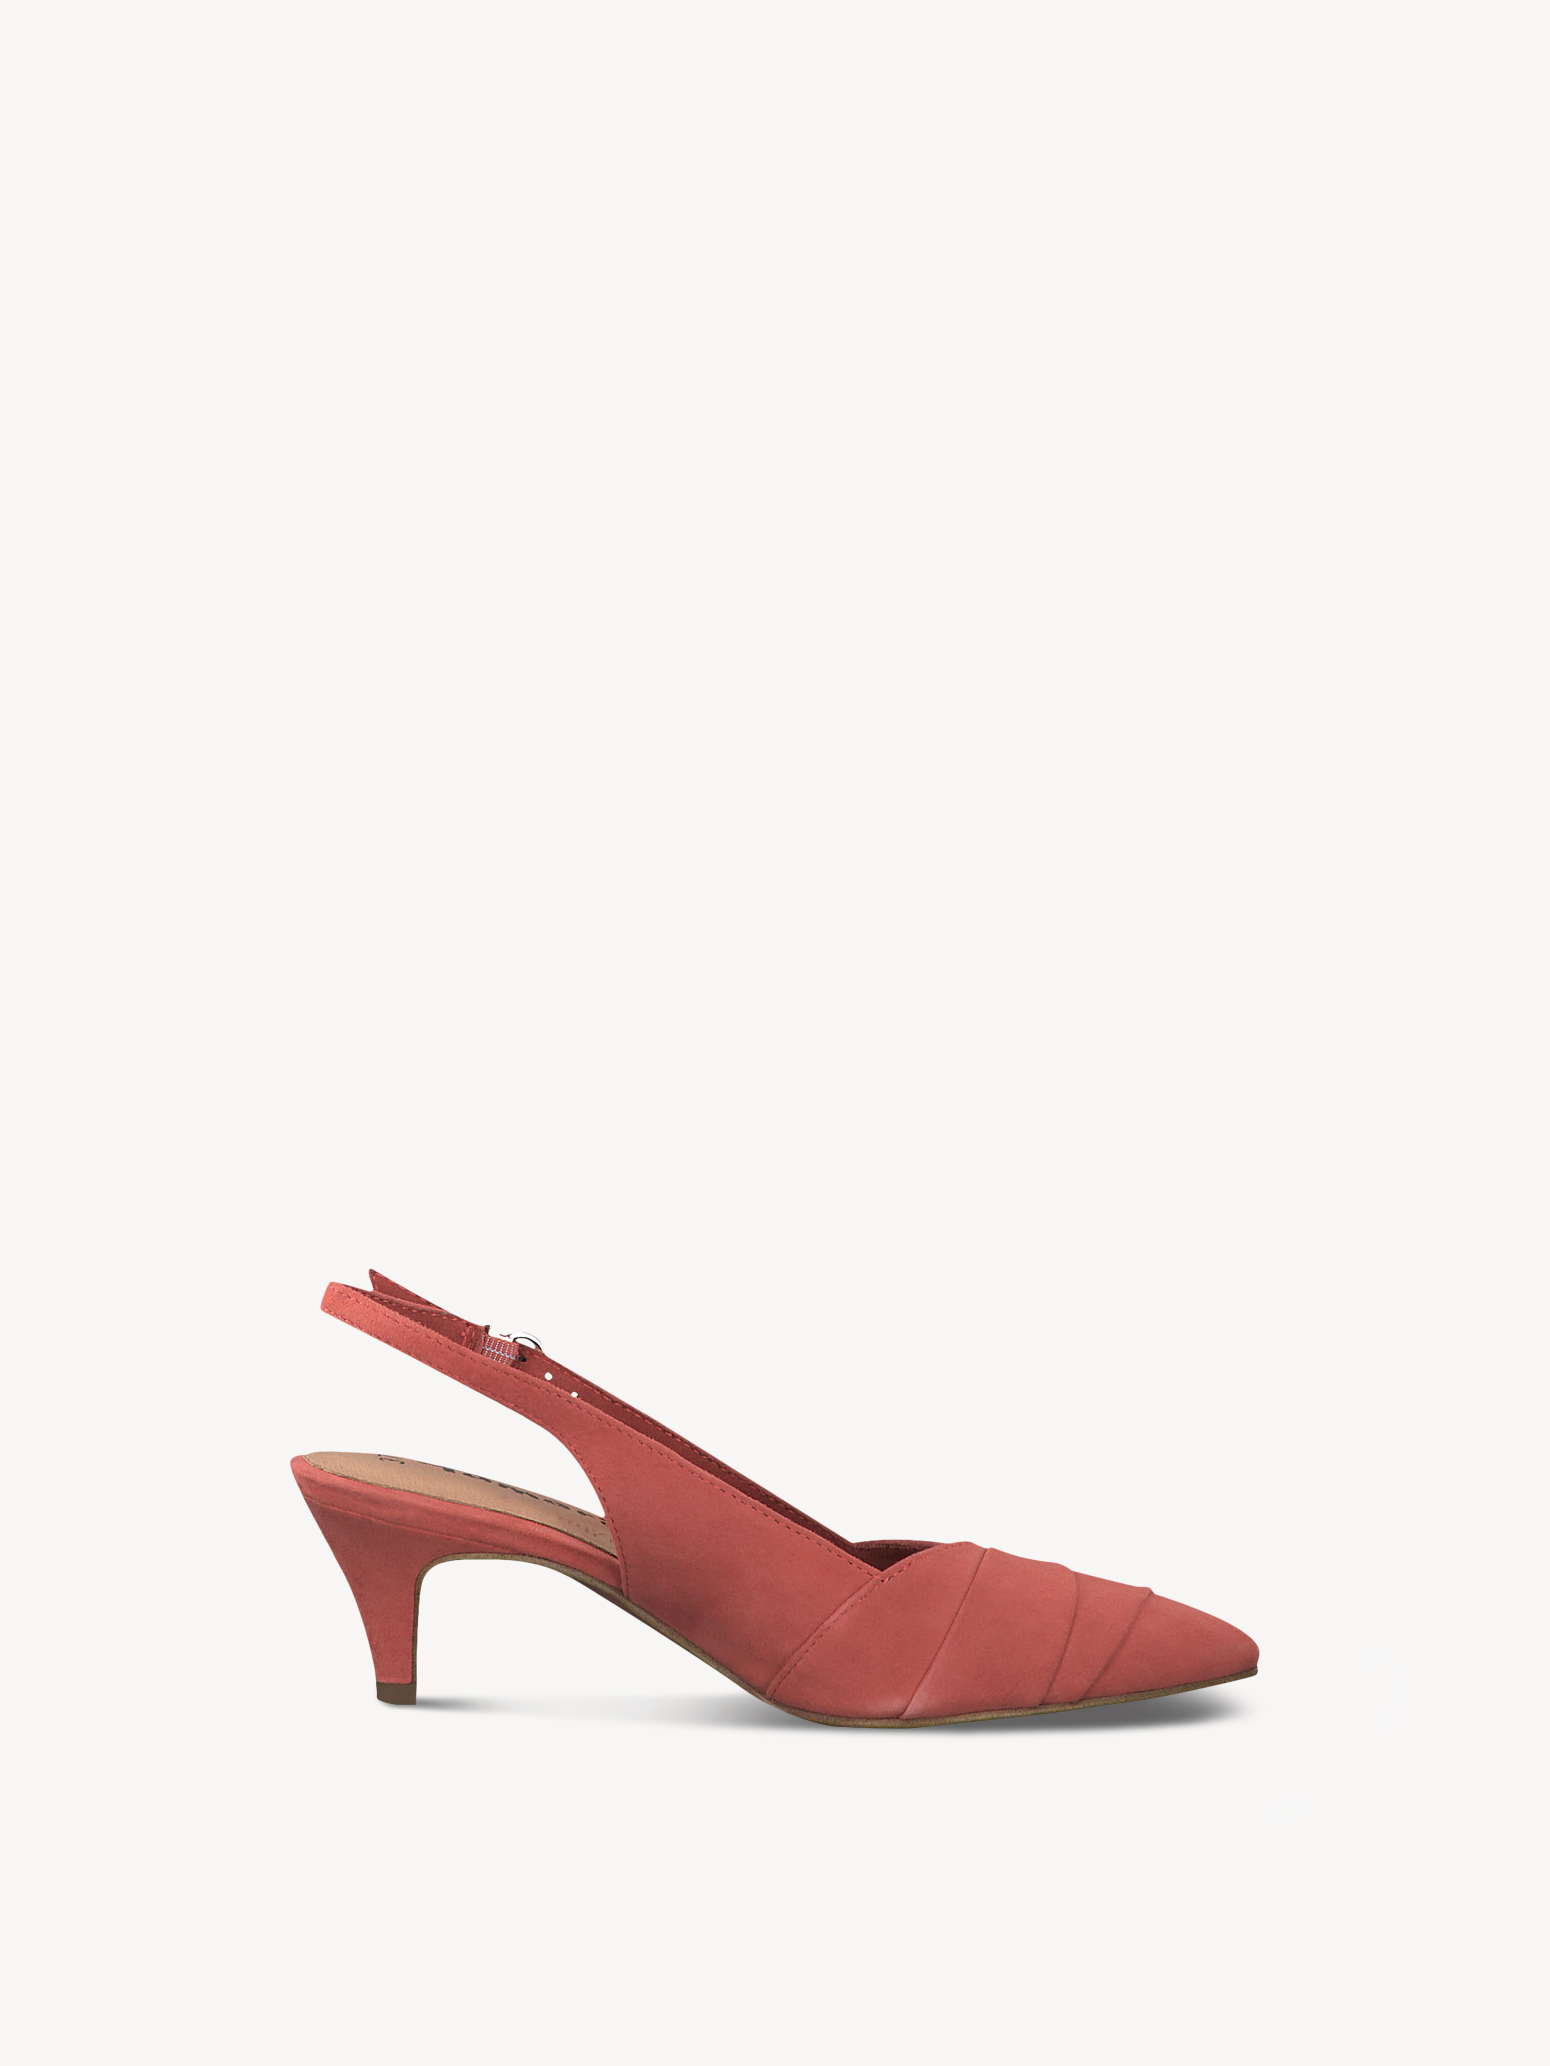 Sandaletten 32Tamaris 1 1 29616 Kaufen Online Lederslingpumps 9YWDIEeH2